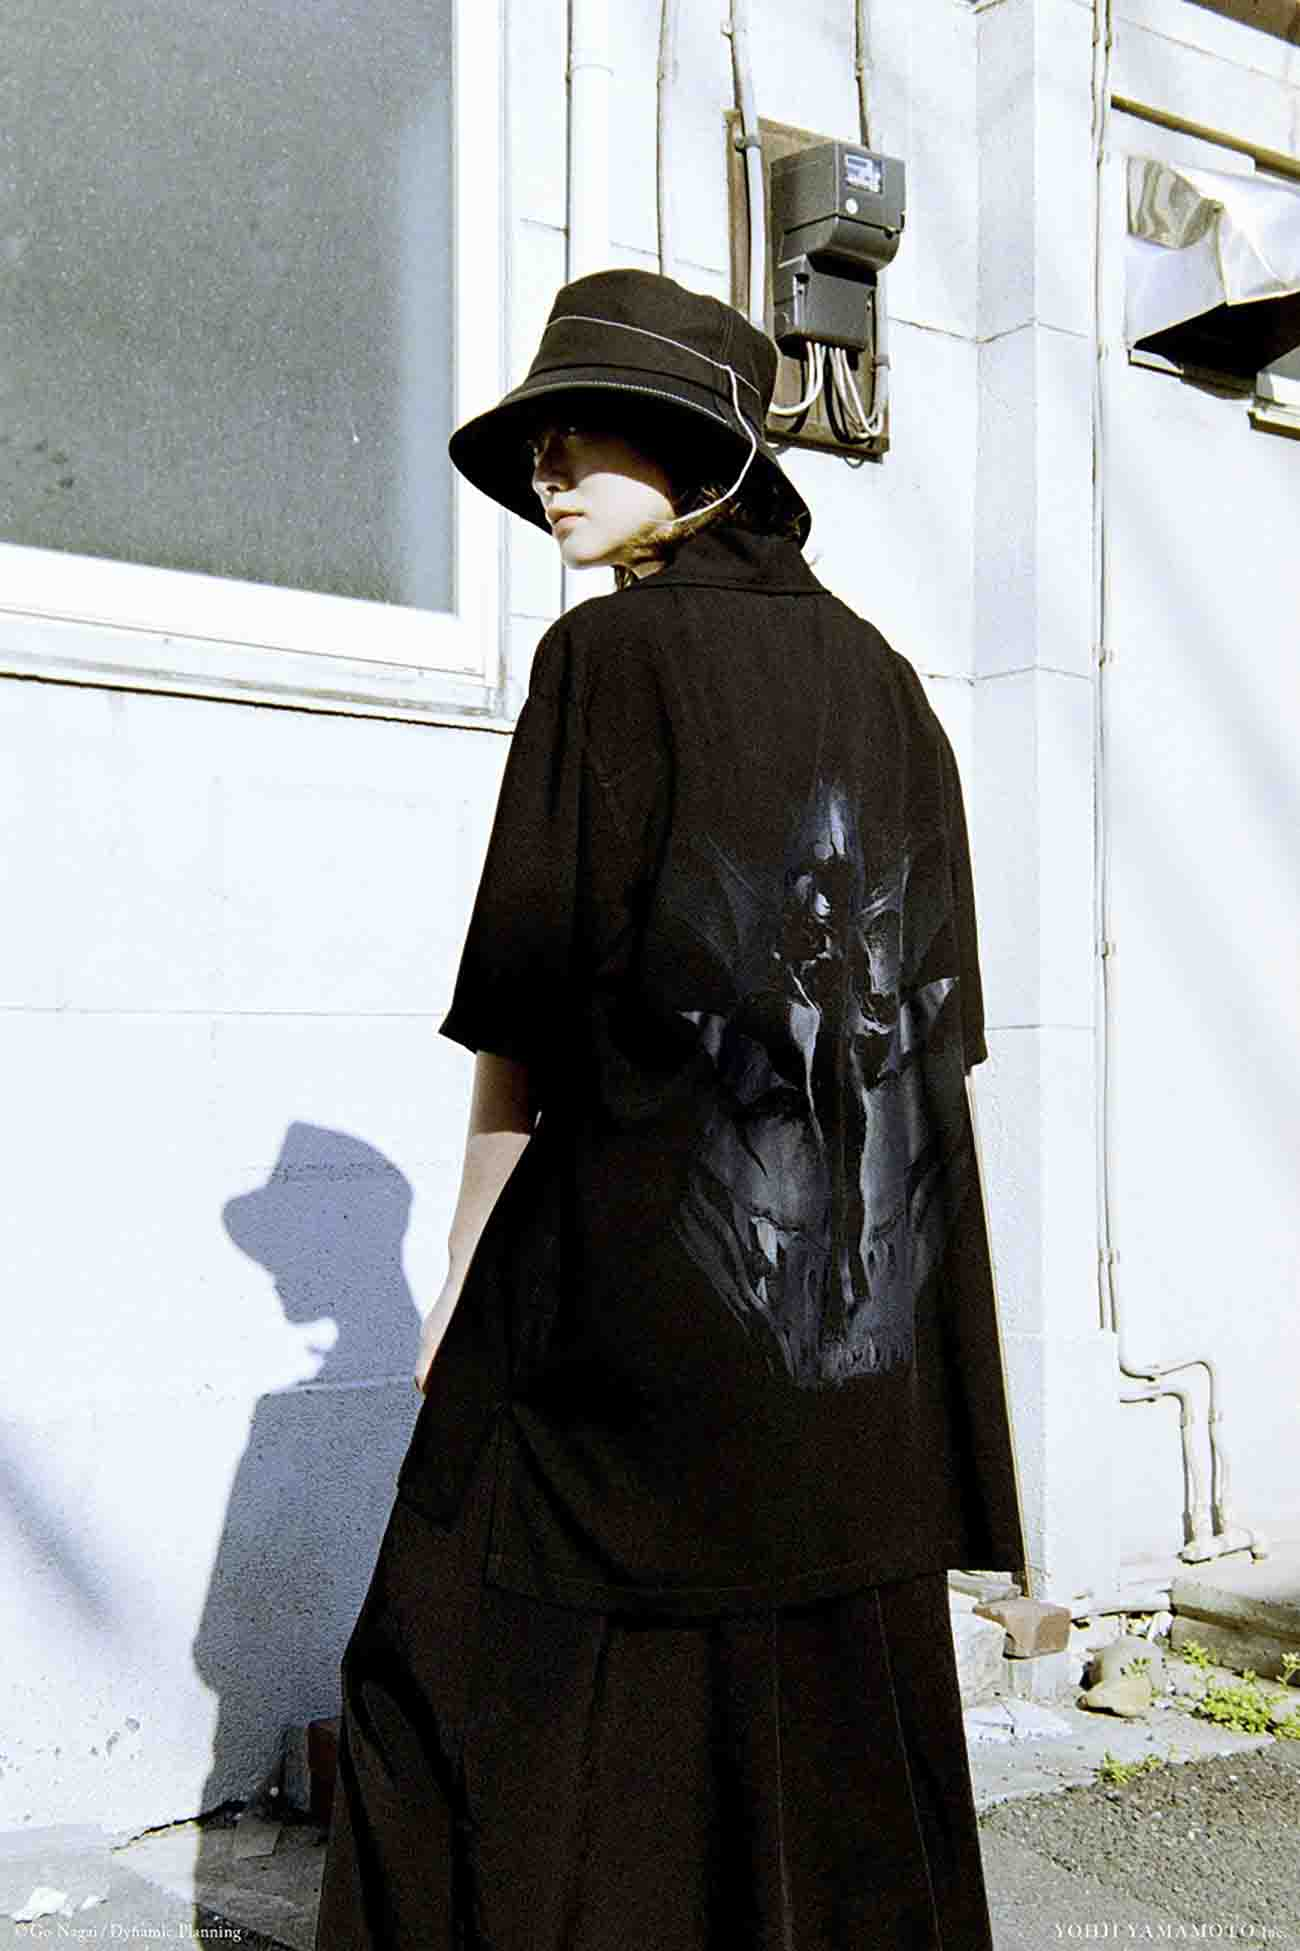 DEVILMAN-デビルマン- Collaboration Short Sleeves Shirt